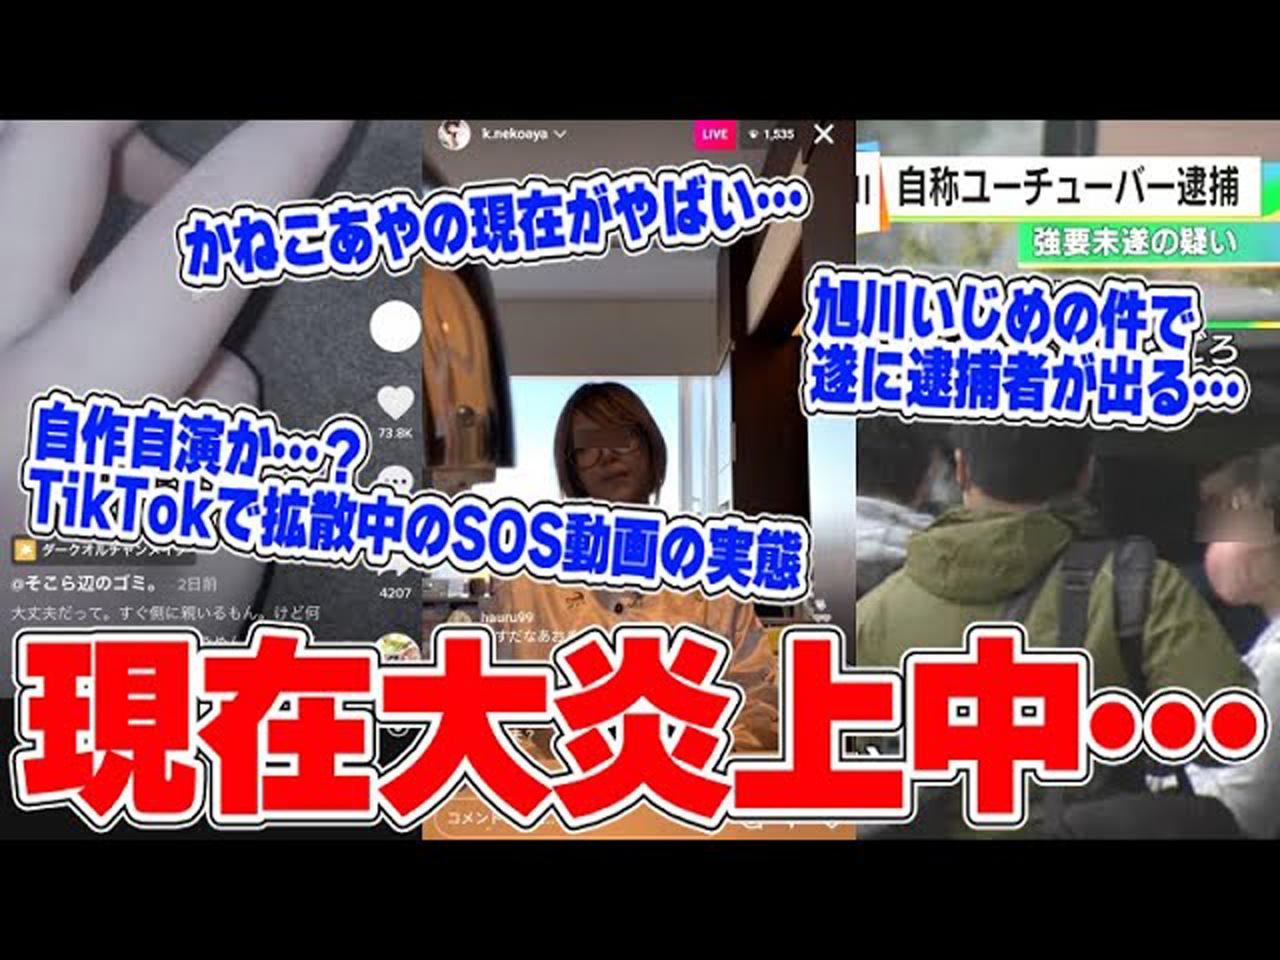 TikTokで話題の栃木虐待投稿 YouTuberのコレコレが音声加工で「うそくさい」